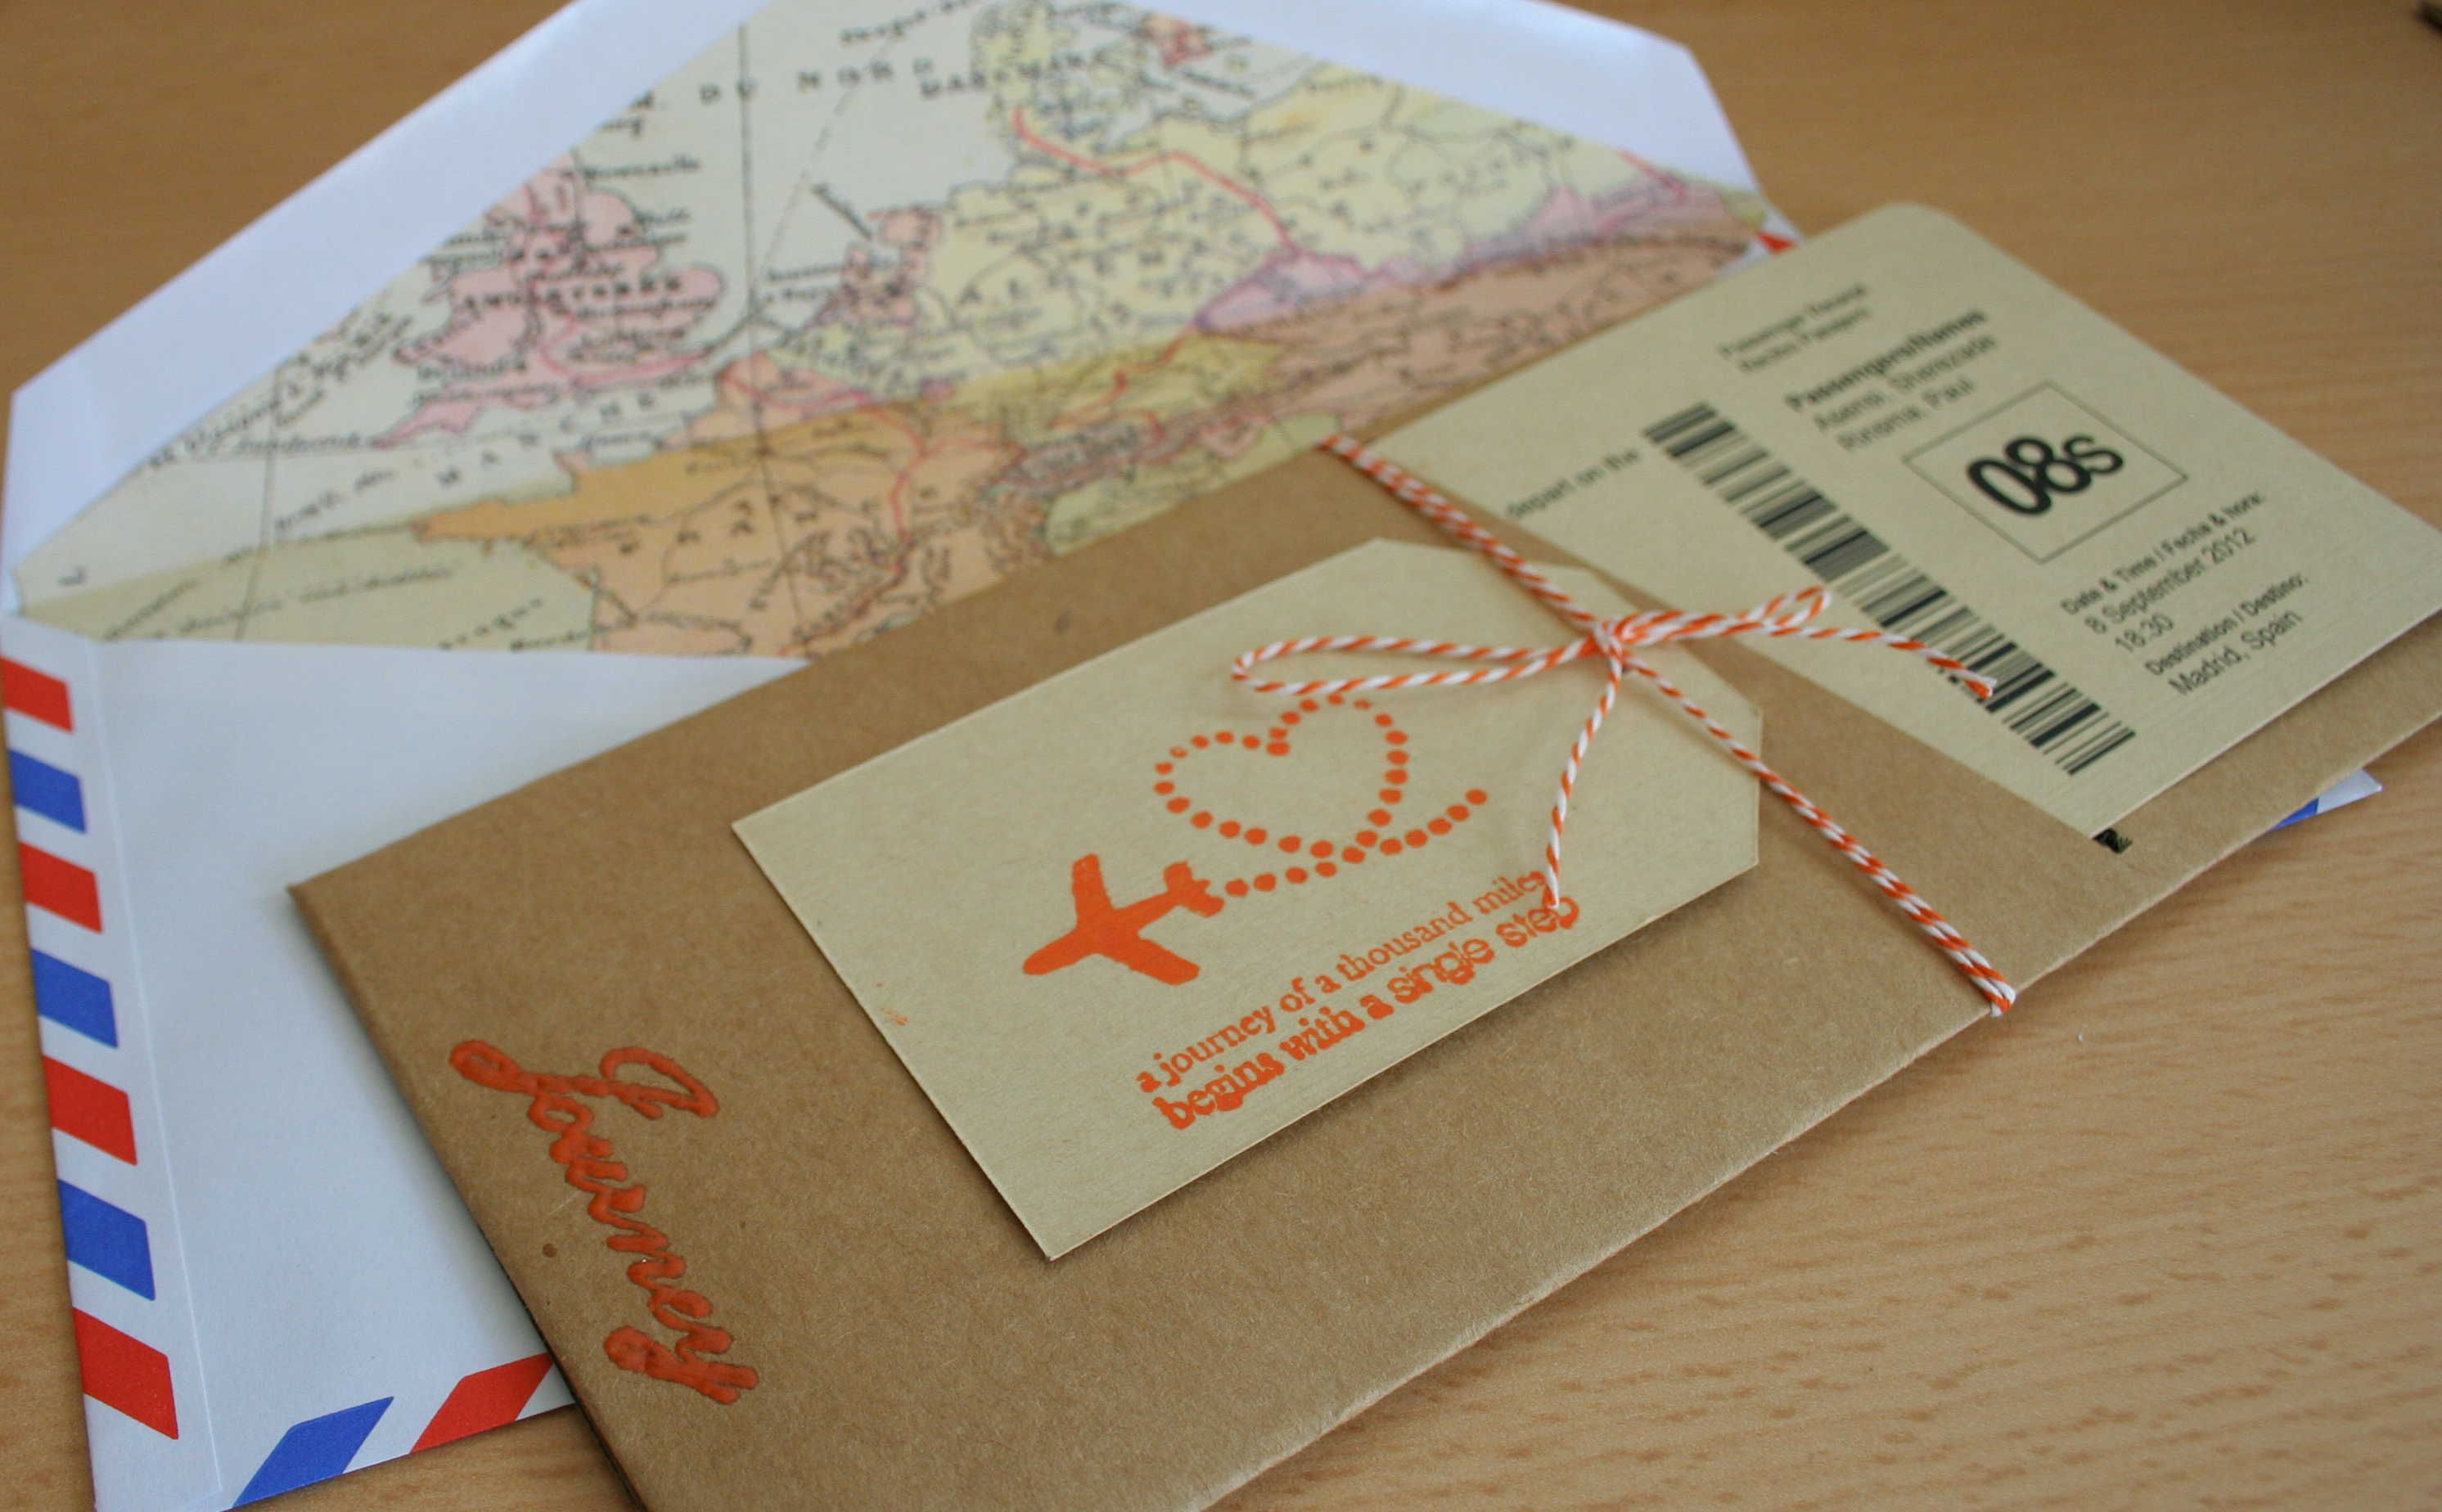 Diy Wedding Invitation Envelopes: Freebie: DIY Boarding Pass Wedding Invitation, Download